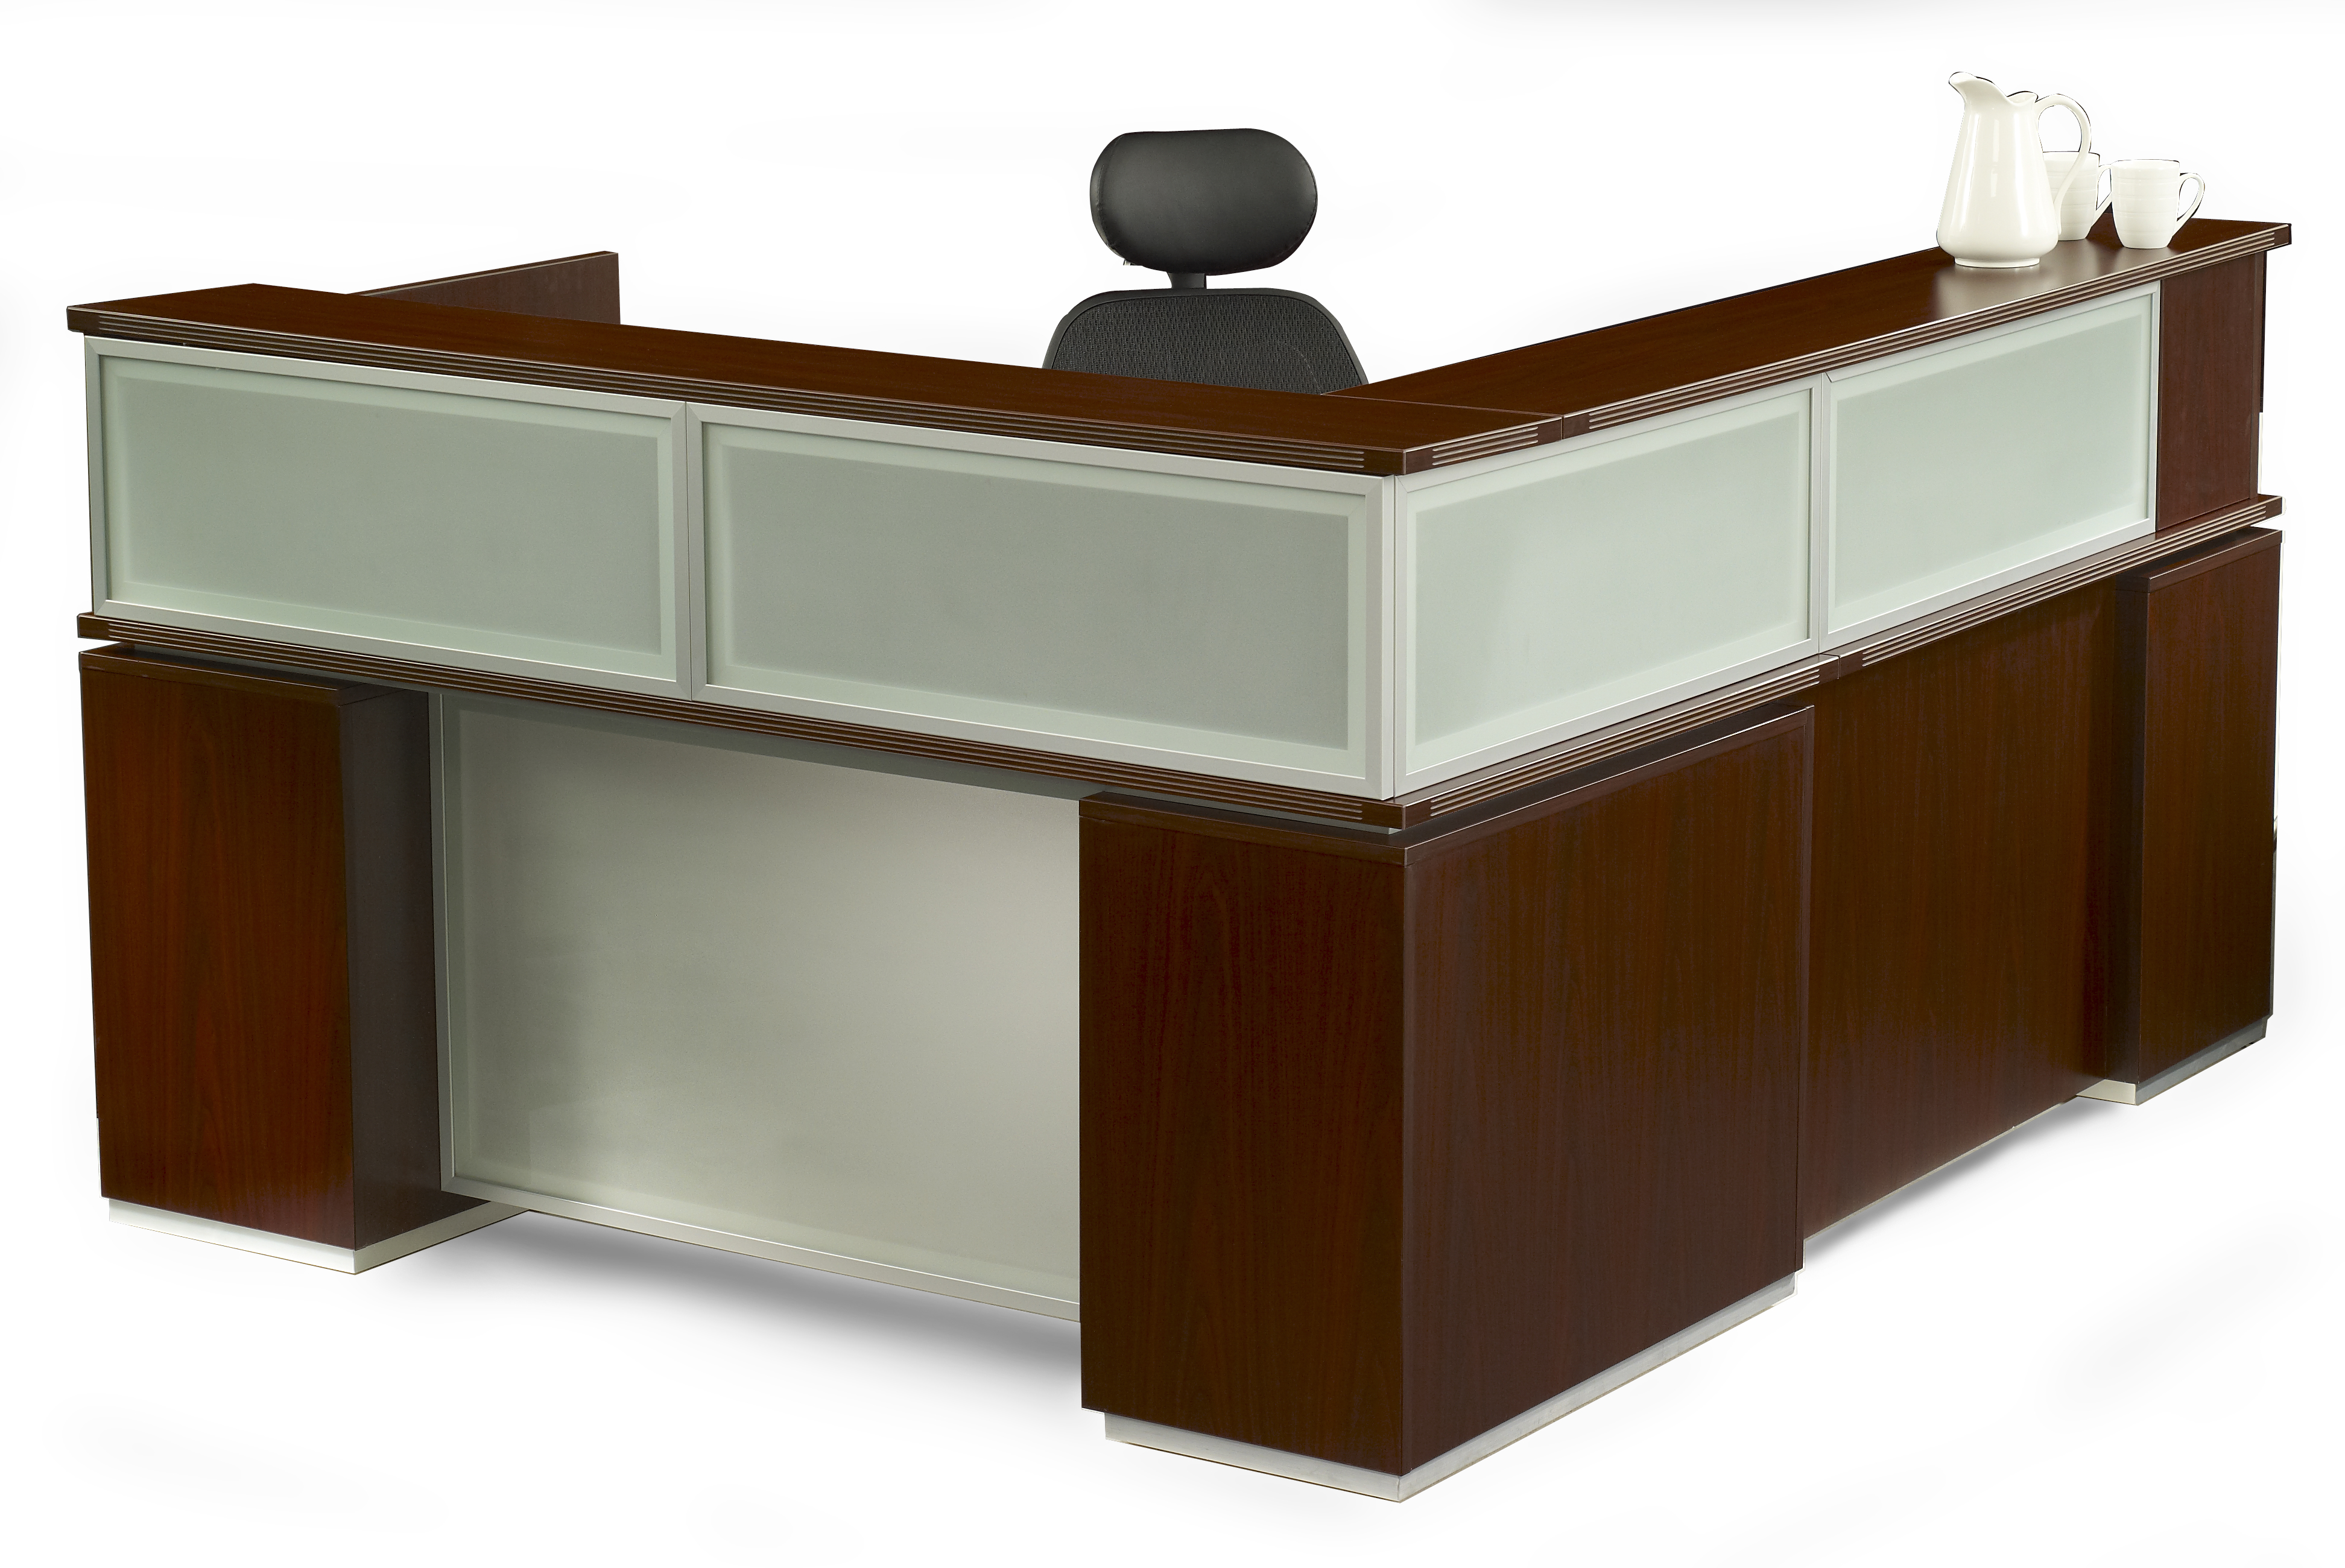 Reception desk definition beautiful reception desk 2017 for Furniture definition